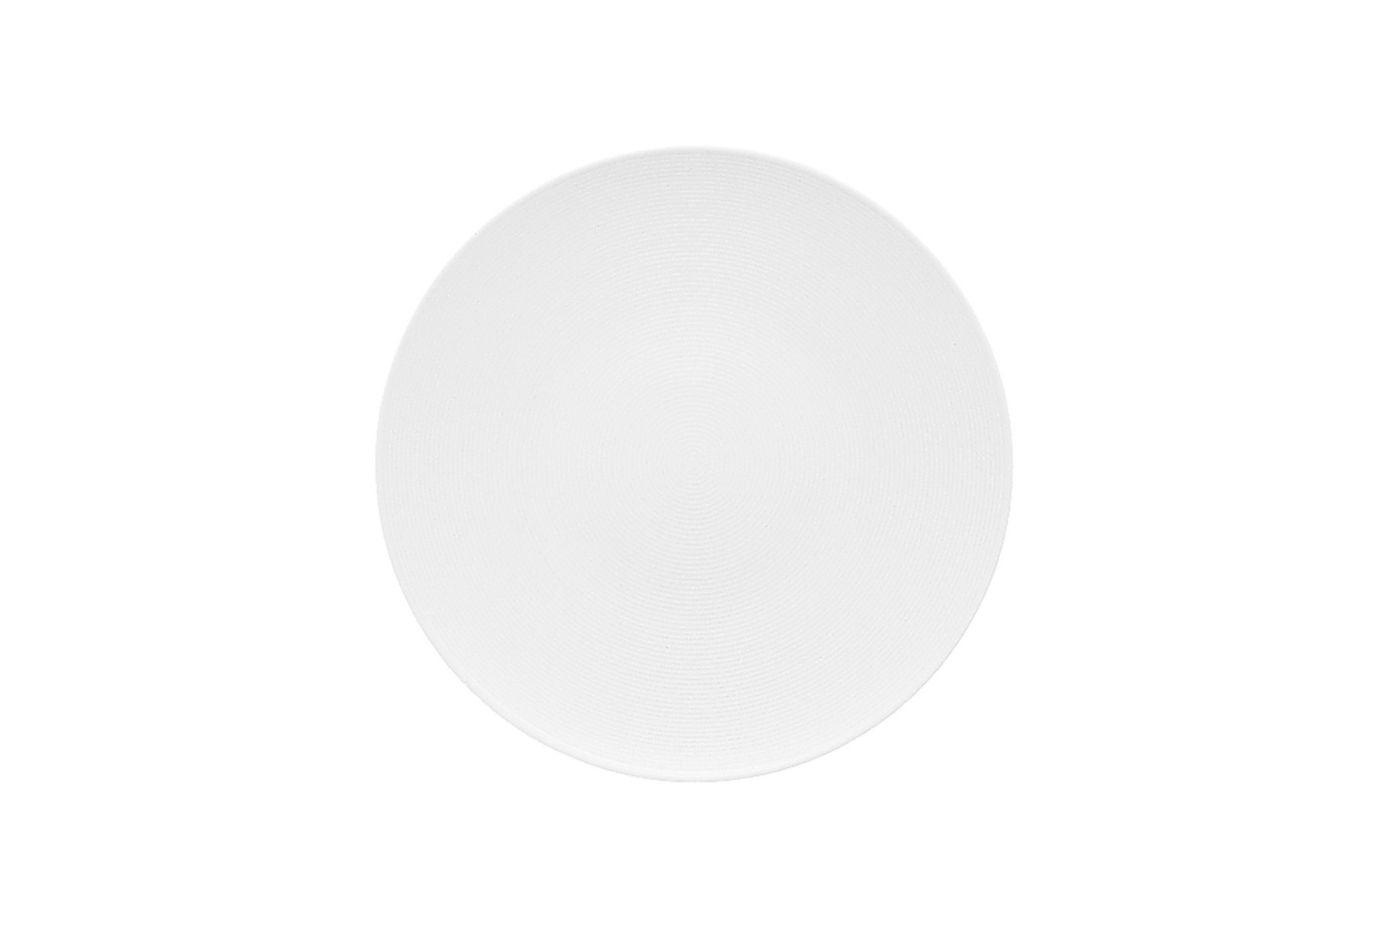 Thomas Loft White Dinner Plate 28cm thumb 1